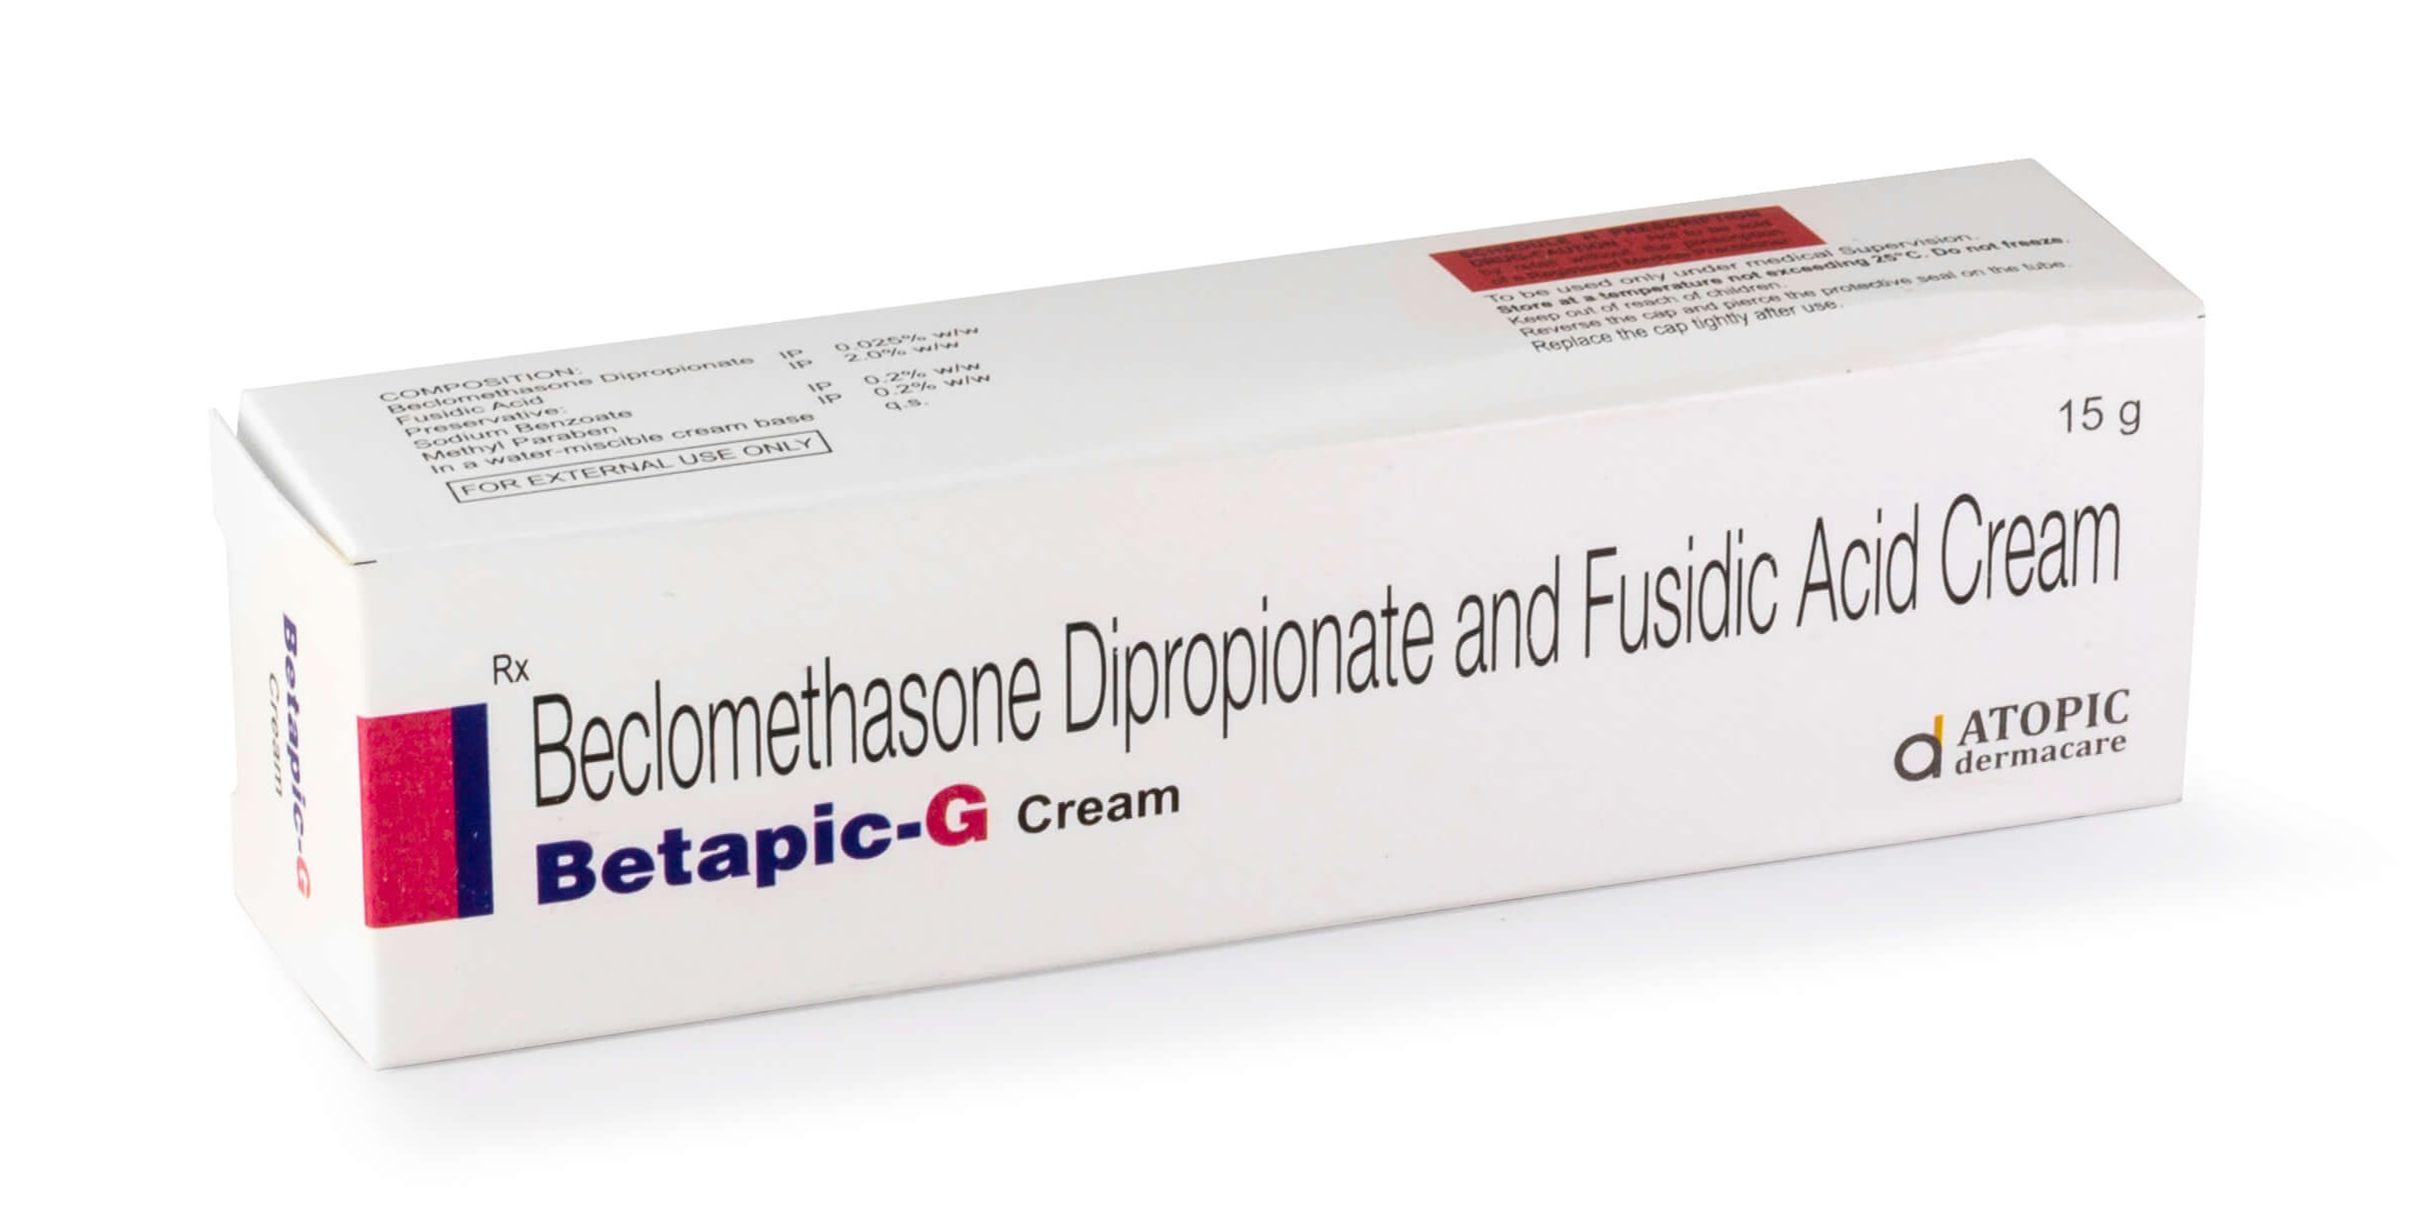 Betapic-G Cream